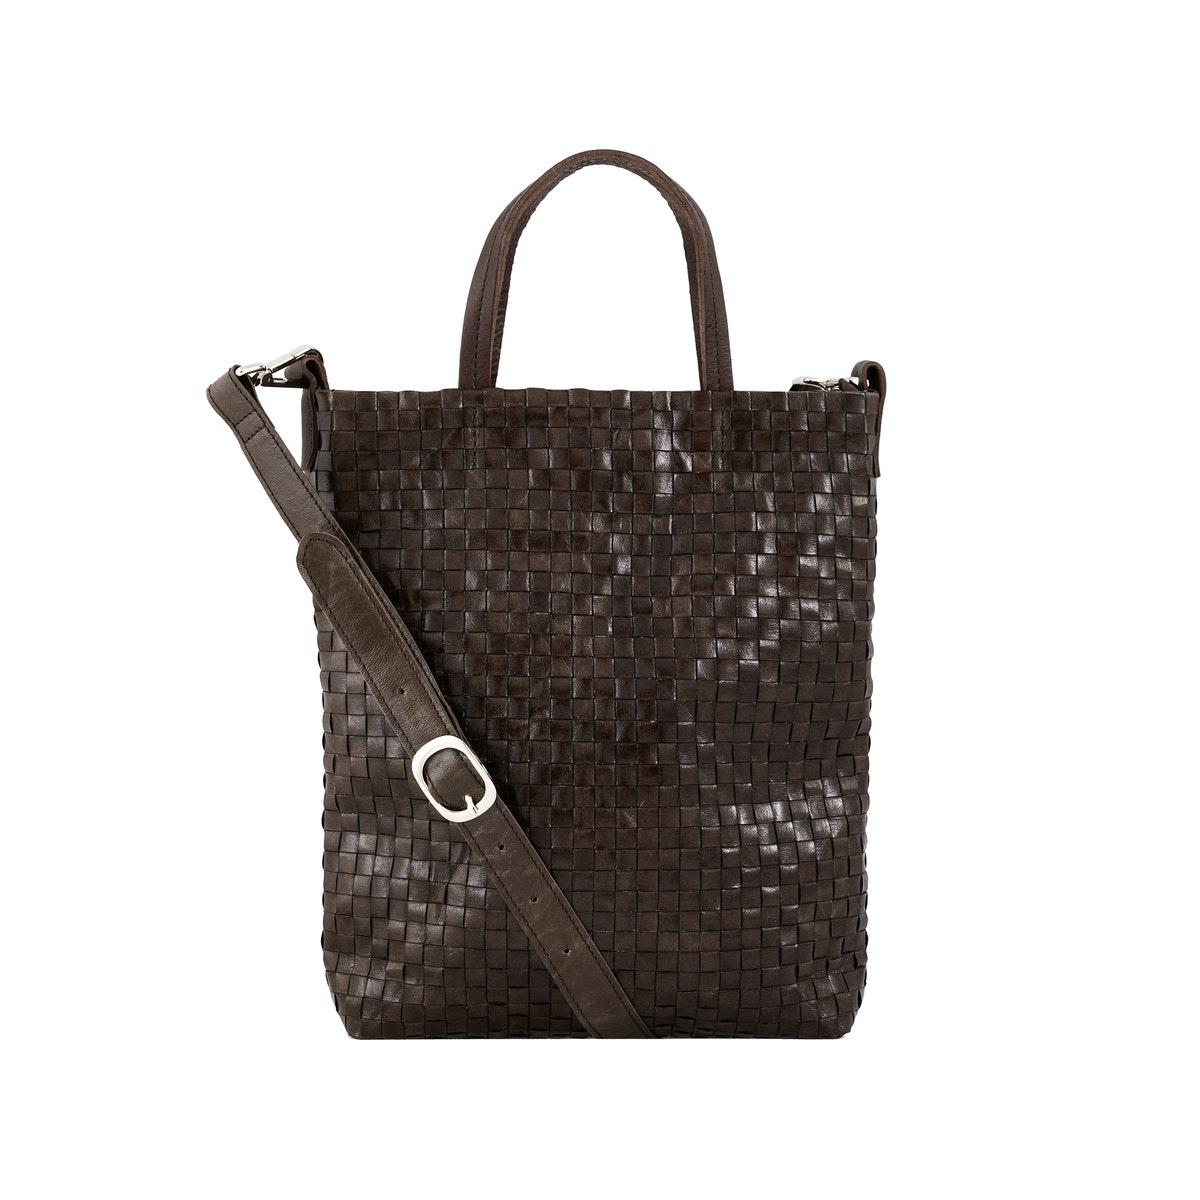 Uashmama Otti Handbag Weaved Caffe